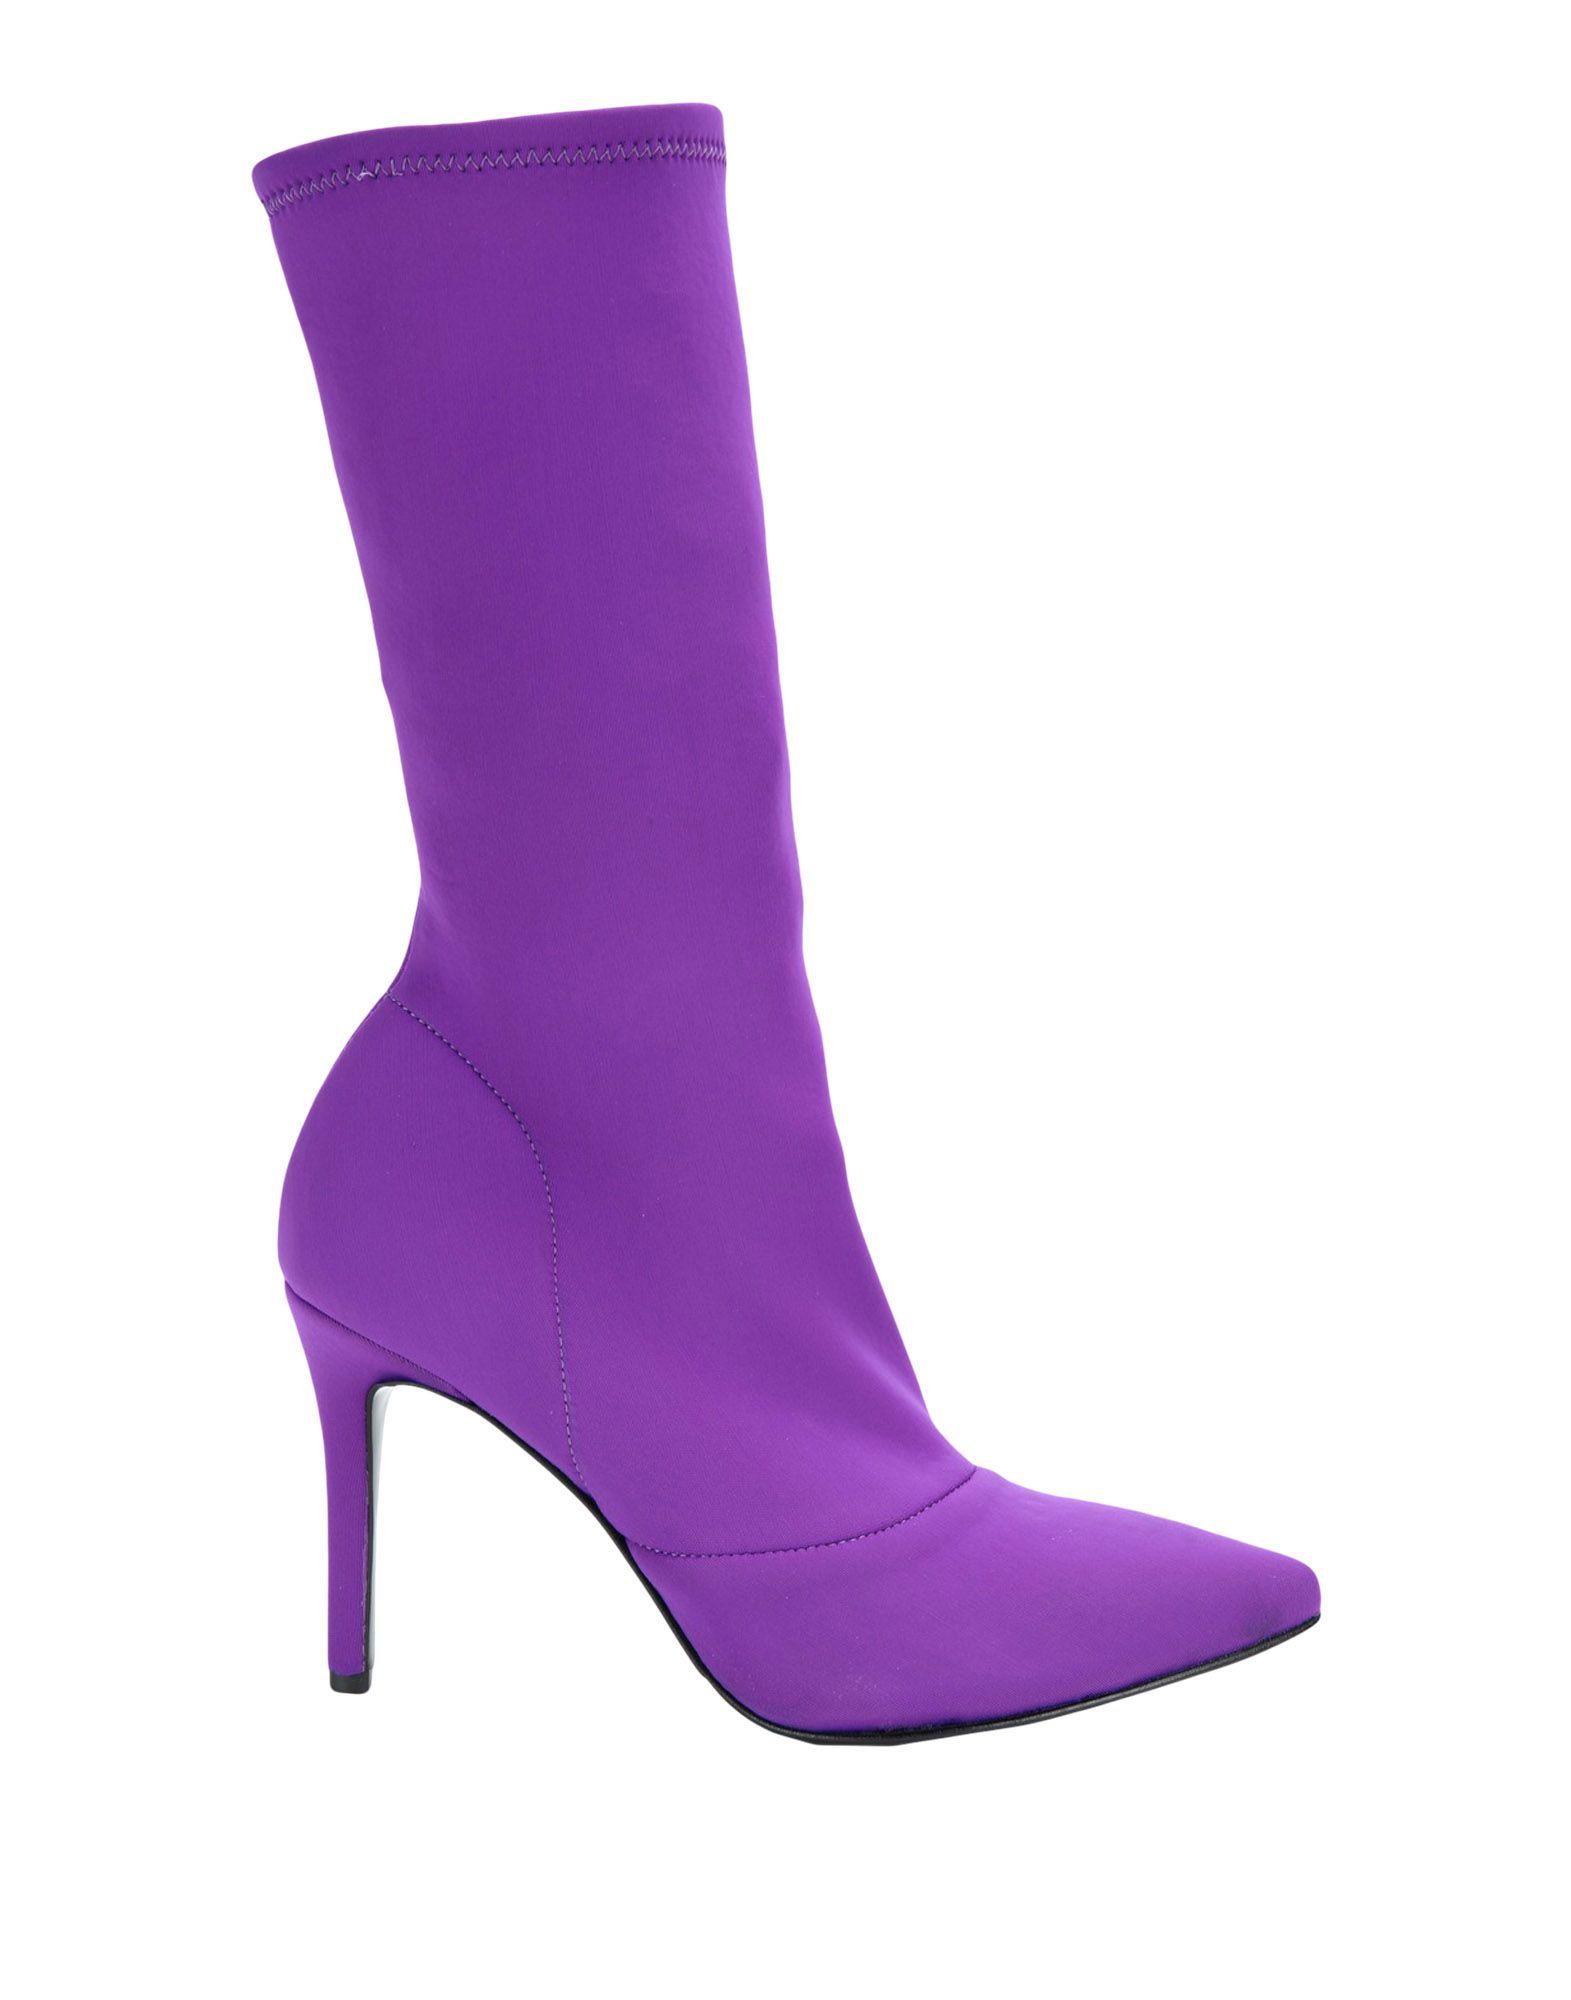 Stilvolle billige Schuhe Damen Stephen Good  London Stiefel Damen Schuhe  11398008VA a32fe4